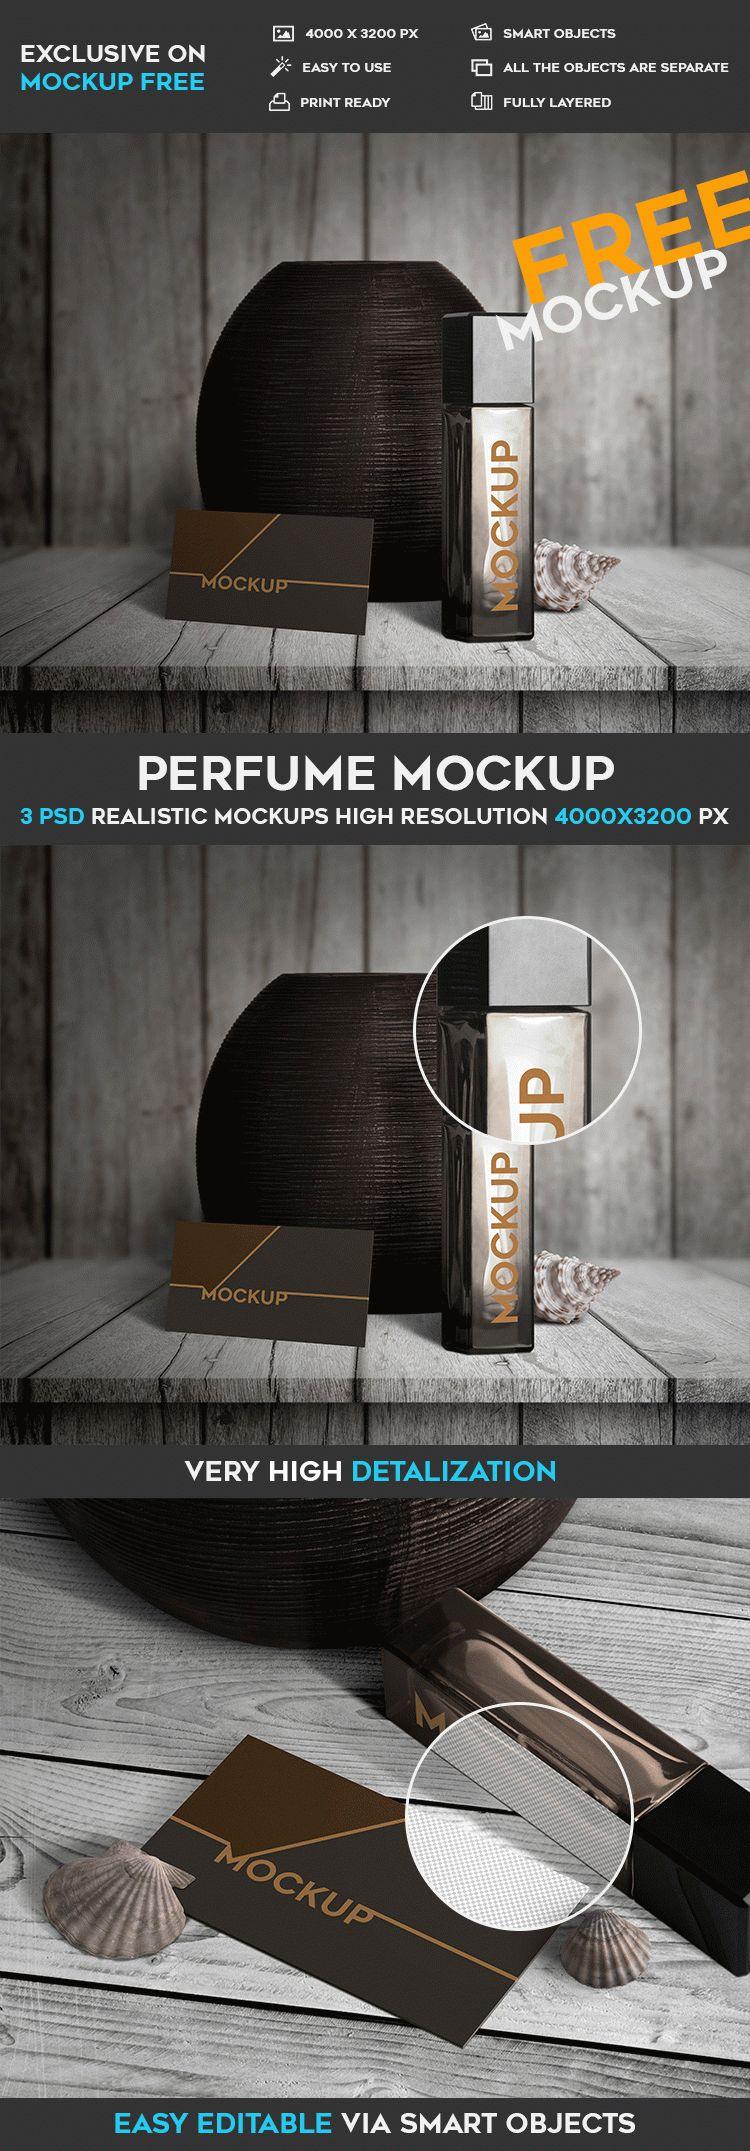 Perfume - 3 Free PSD Mockups